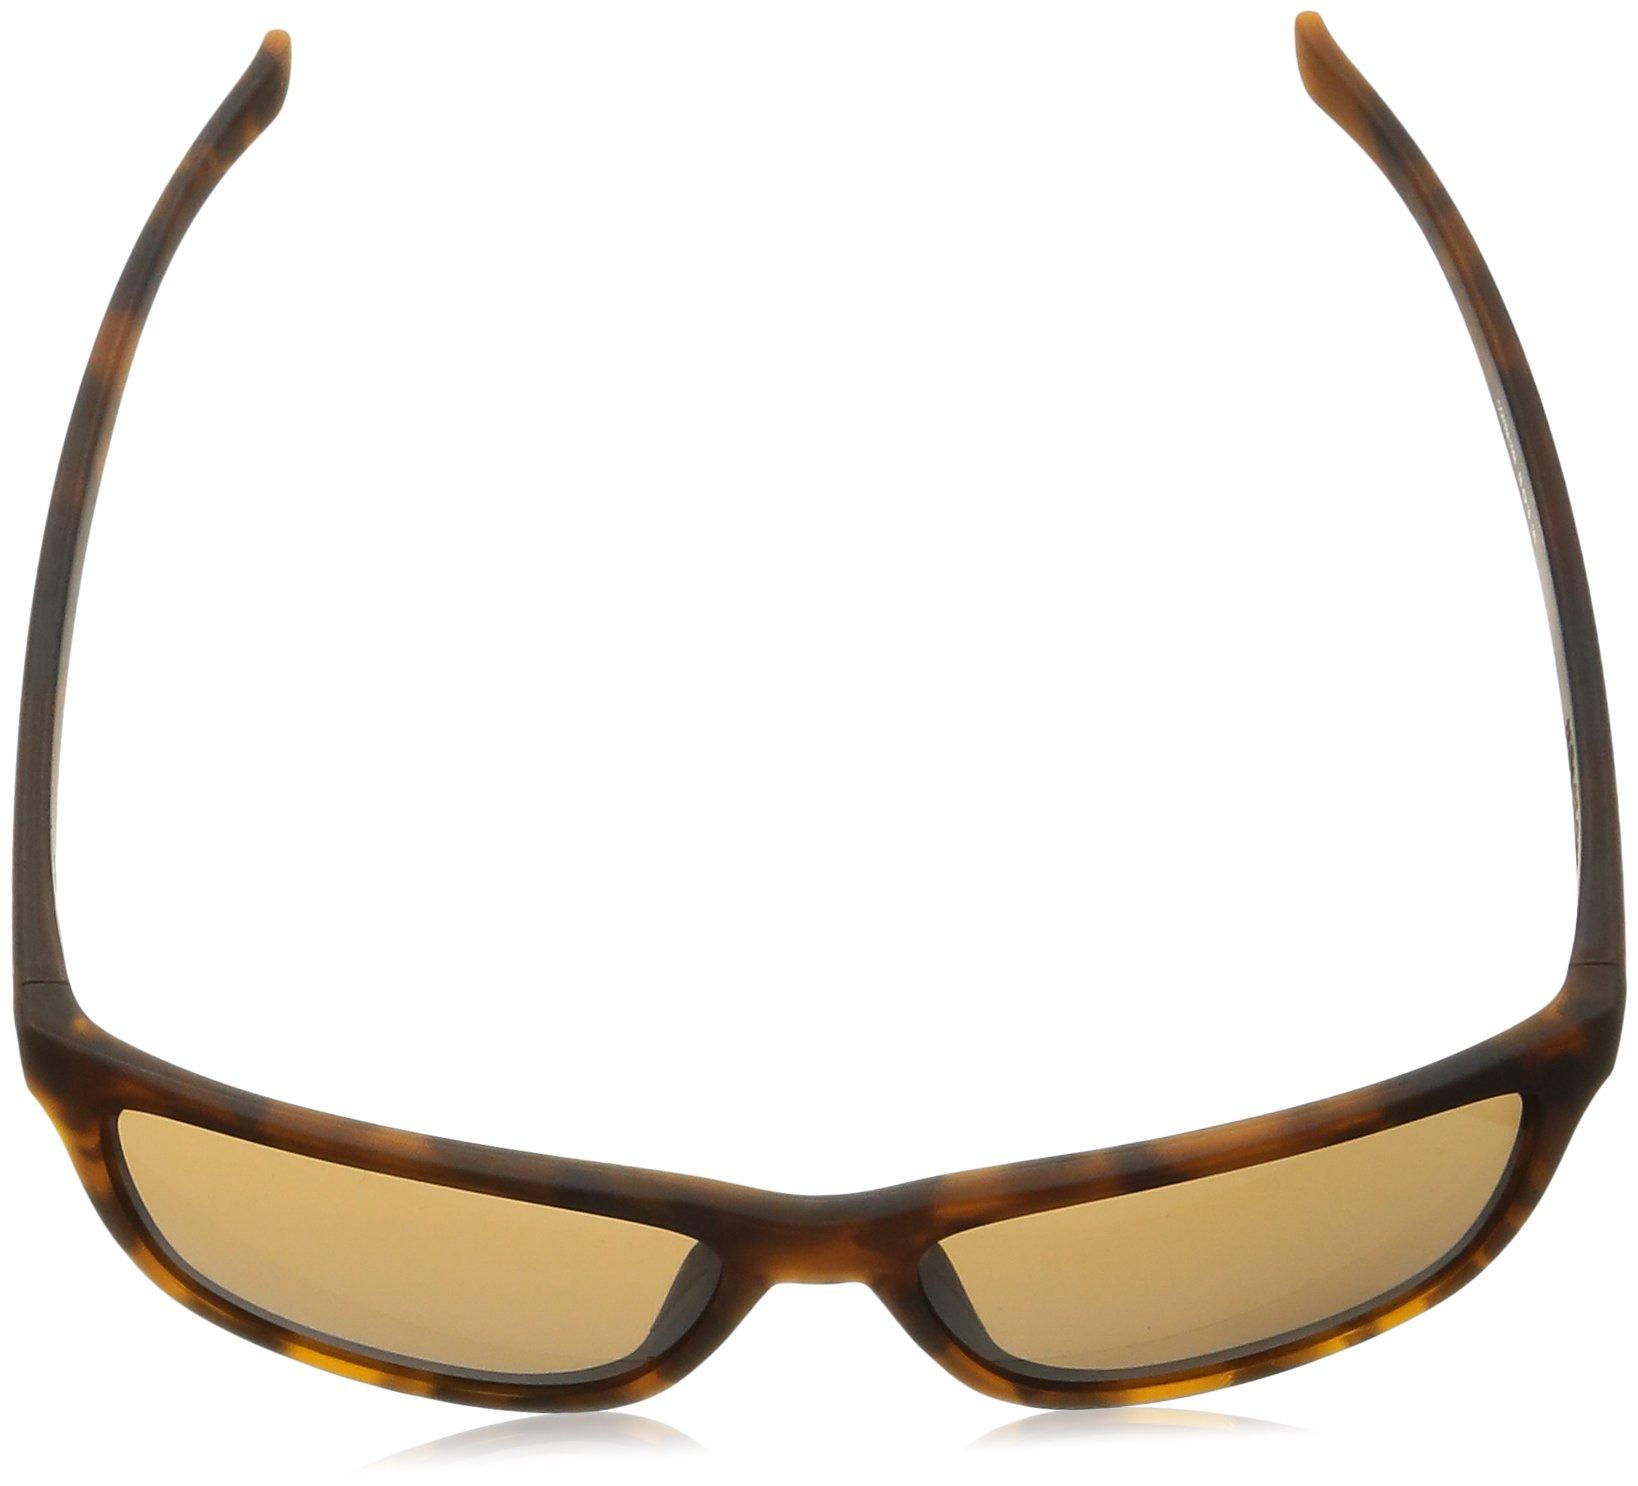 Ray-Ban Herren Sonnenbrille Holston, Braun (Marrón), 57   Amazon c0e429b65c1e